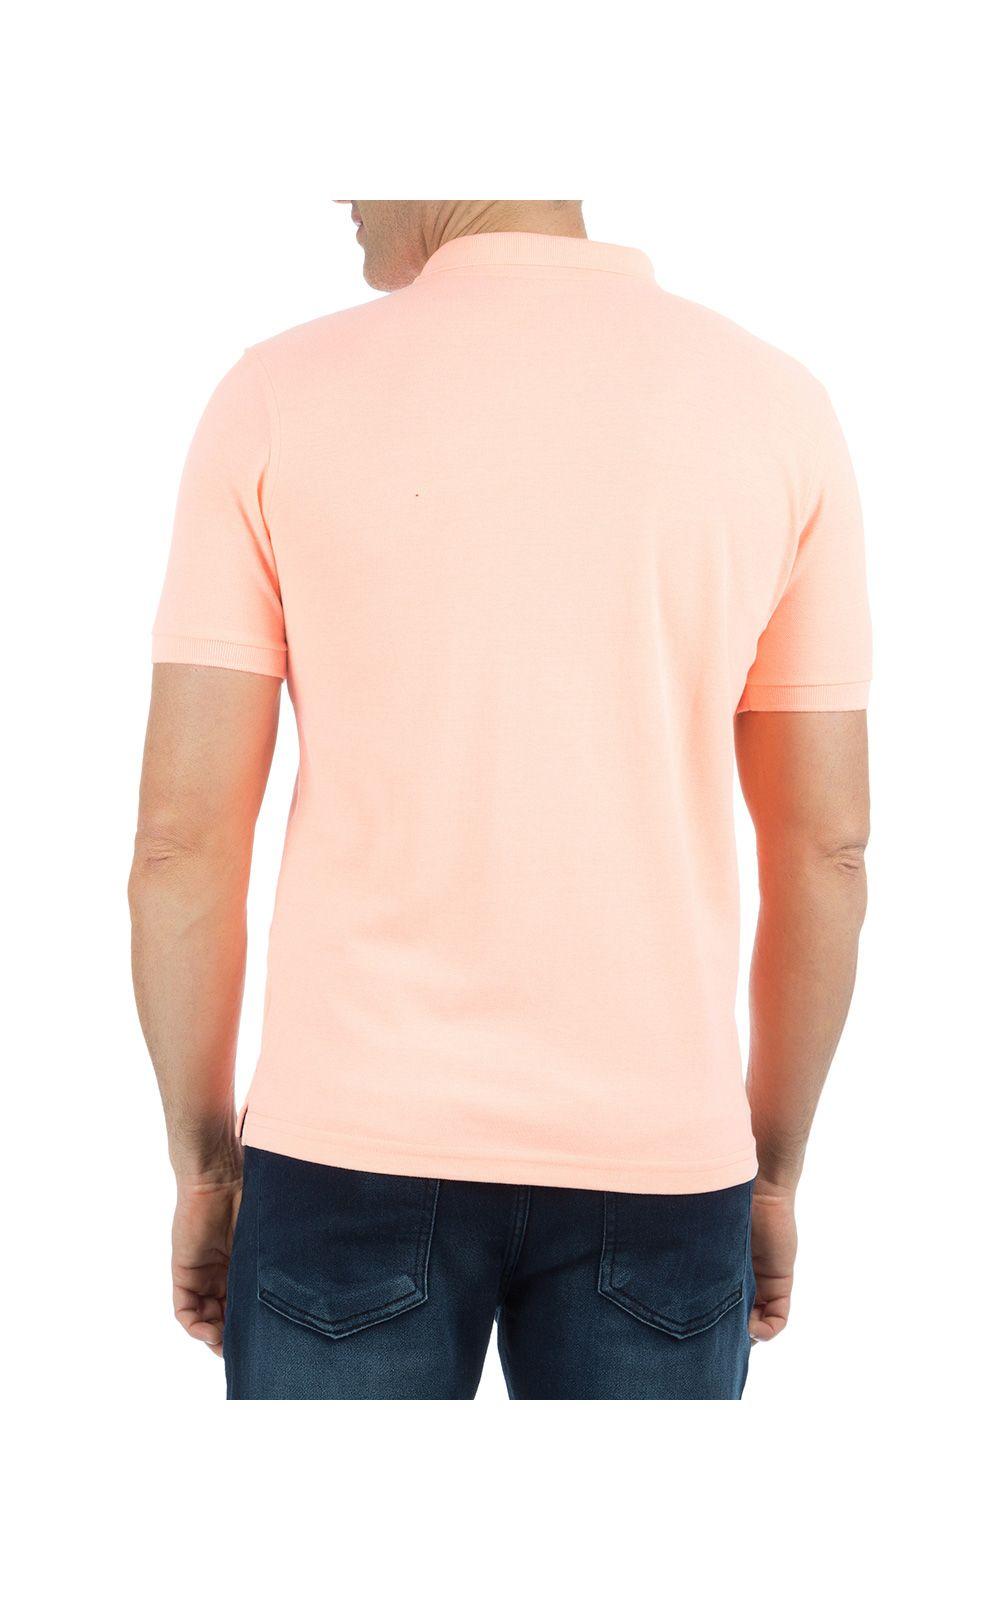 Foto 2 - Camisa Polo Masculina Laranja Lisa